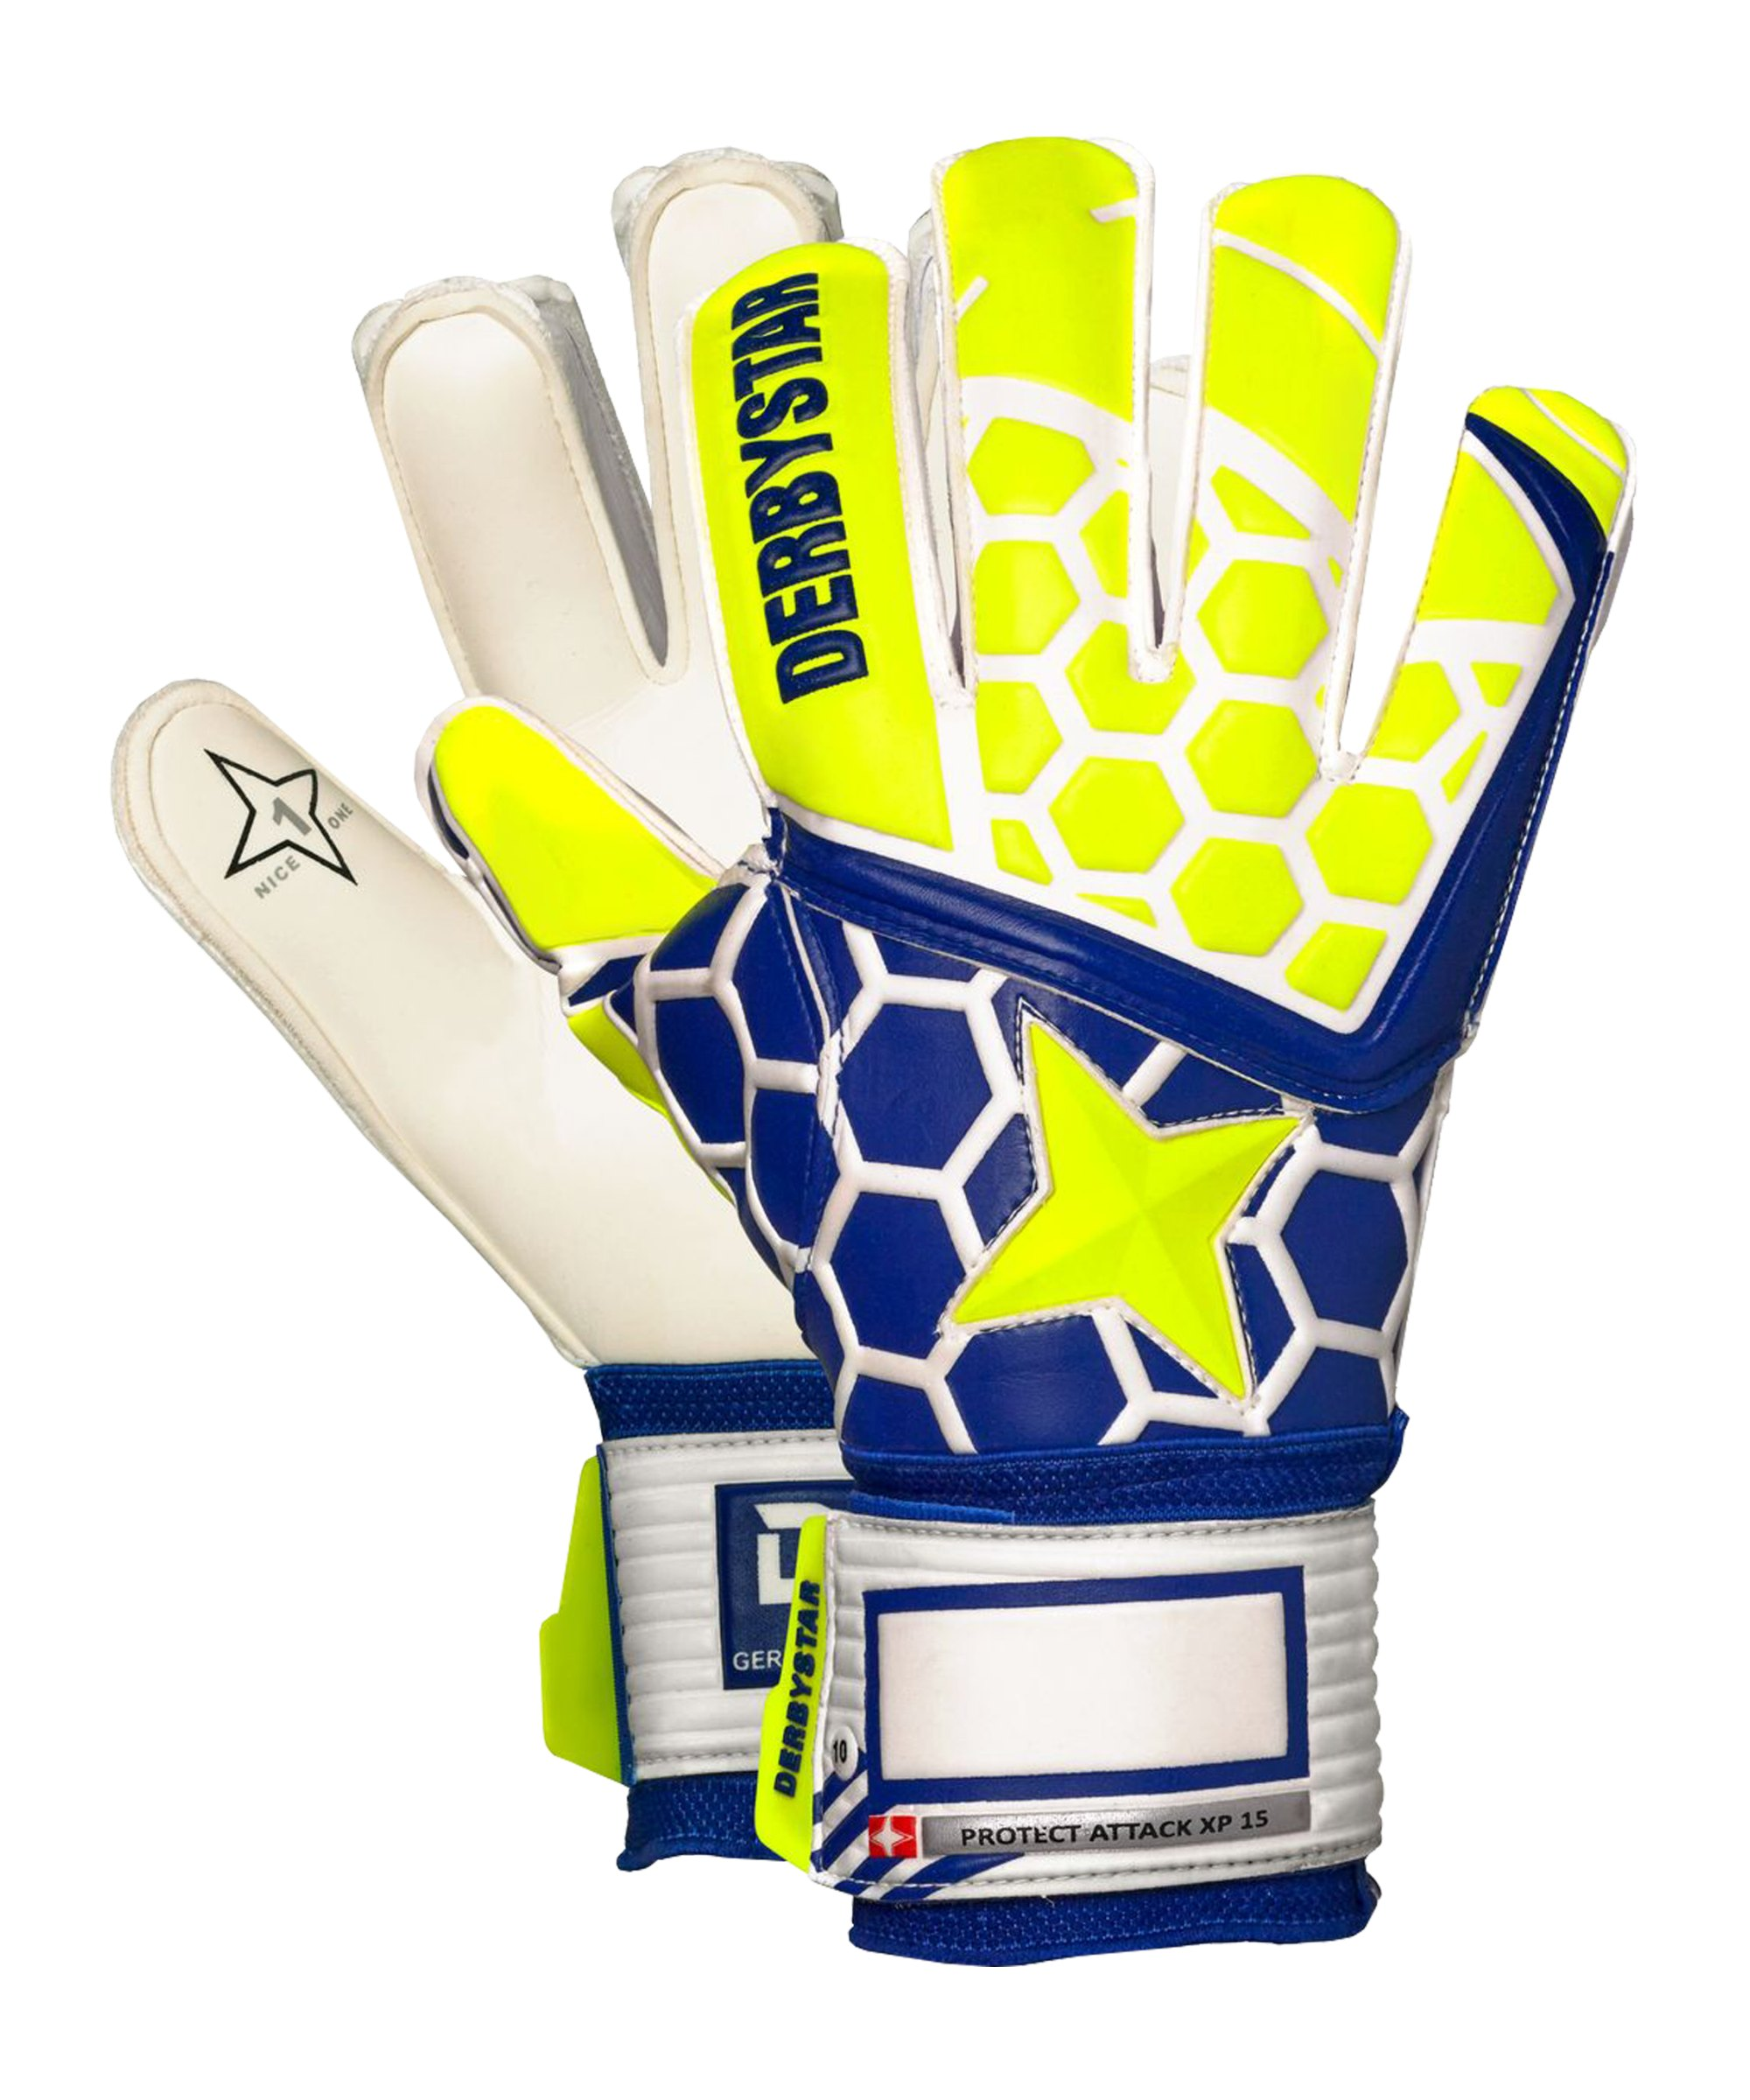 Derbystar Protect Attack XP15 TW-Handschuh F000 - gelb